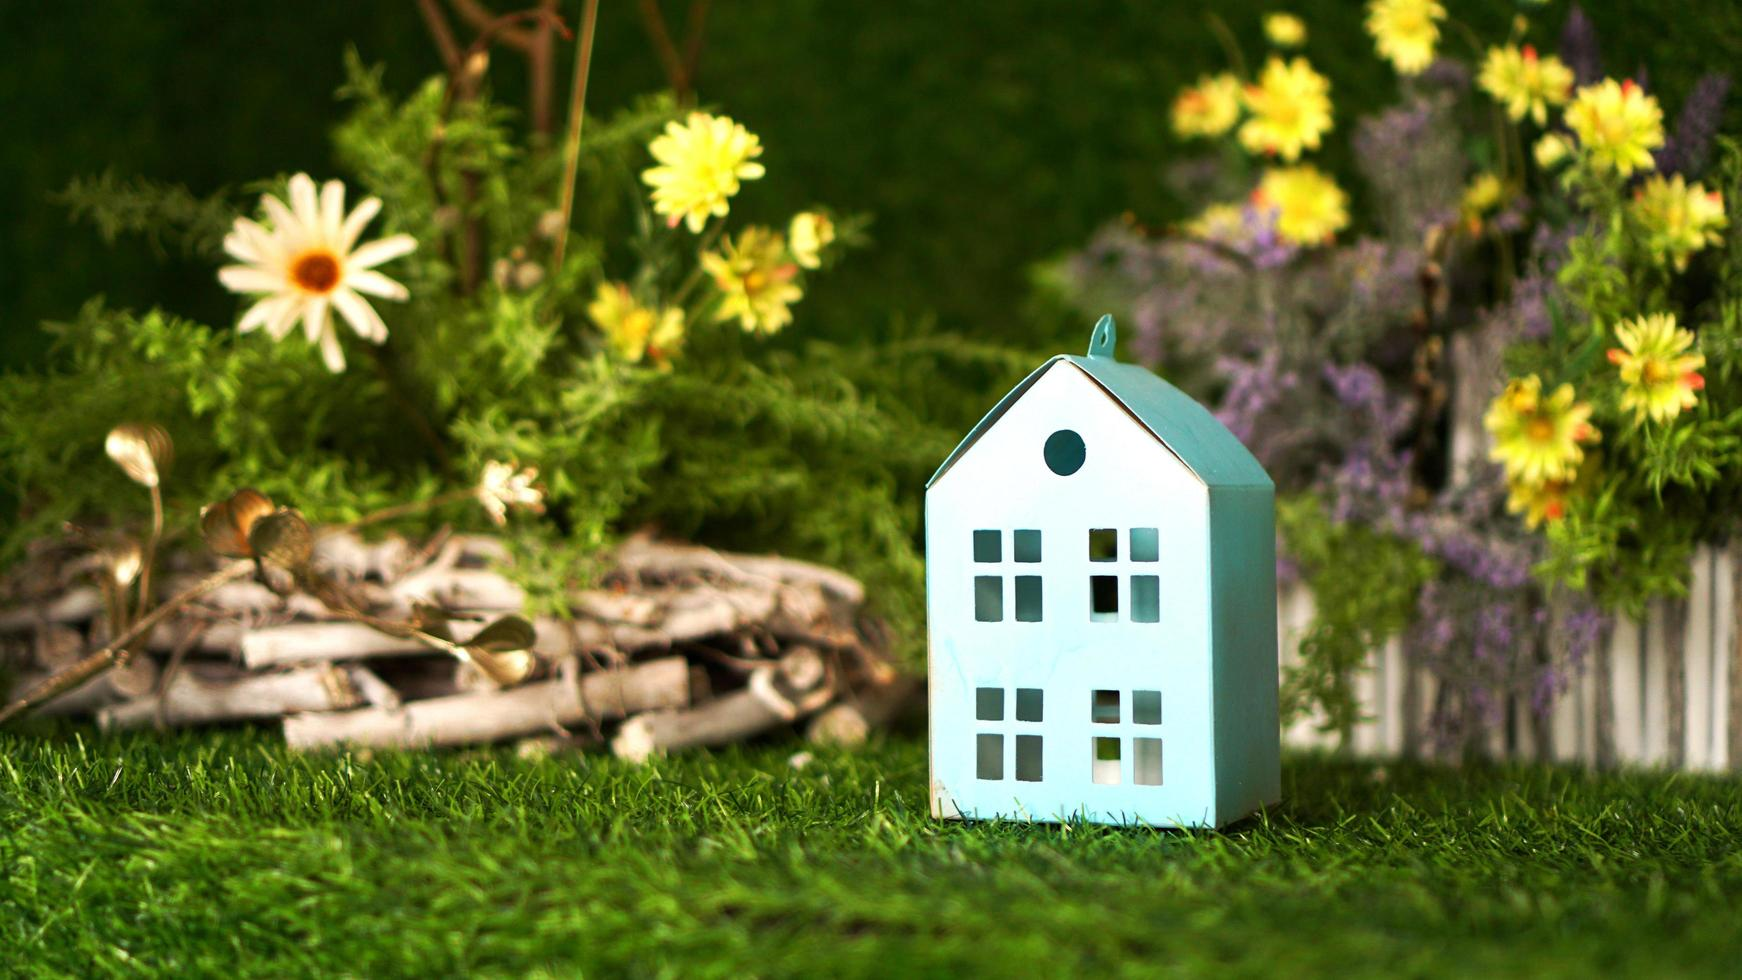 kartong blå hus på bakgrund av grön vår foto